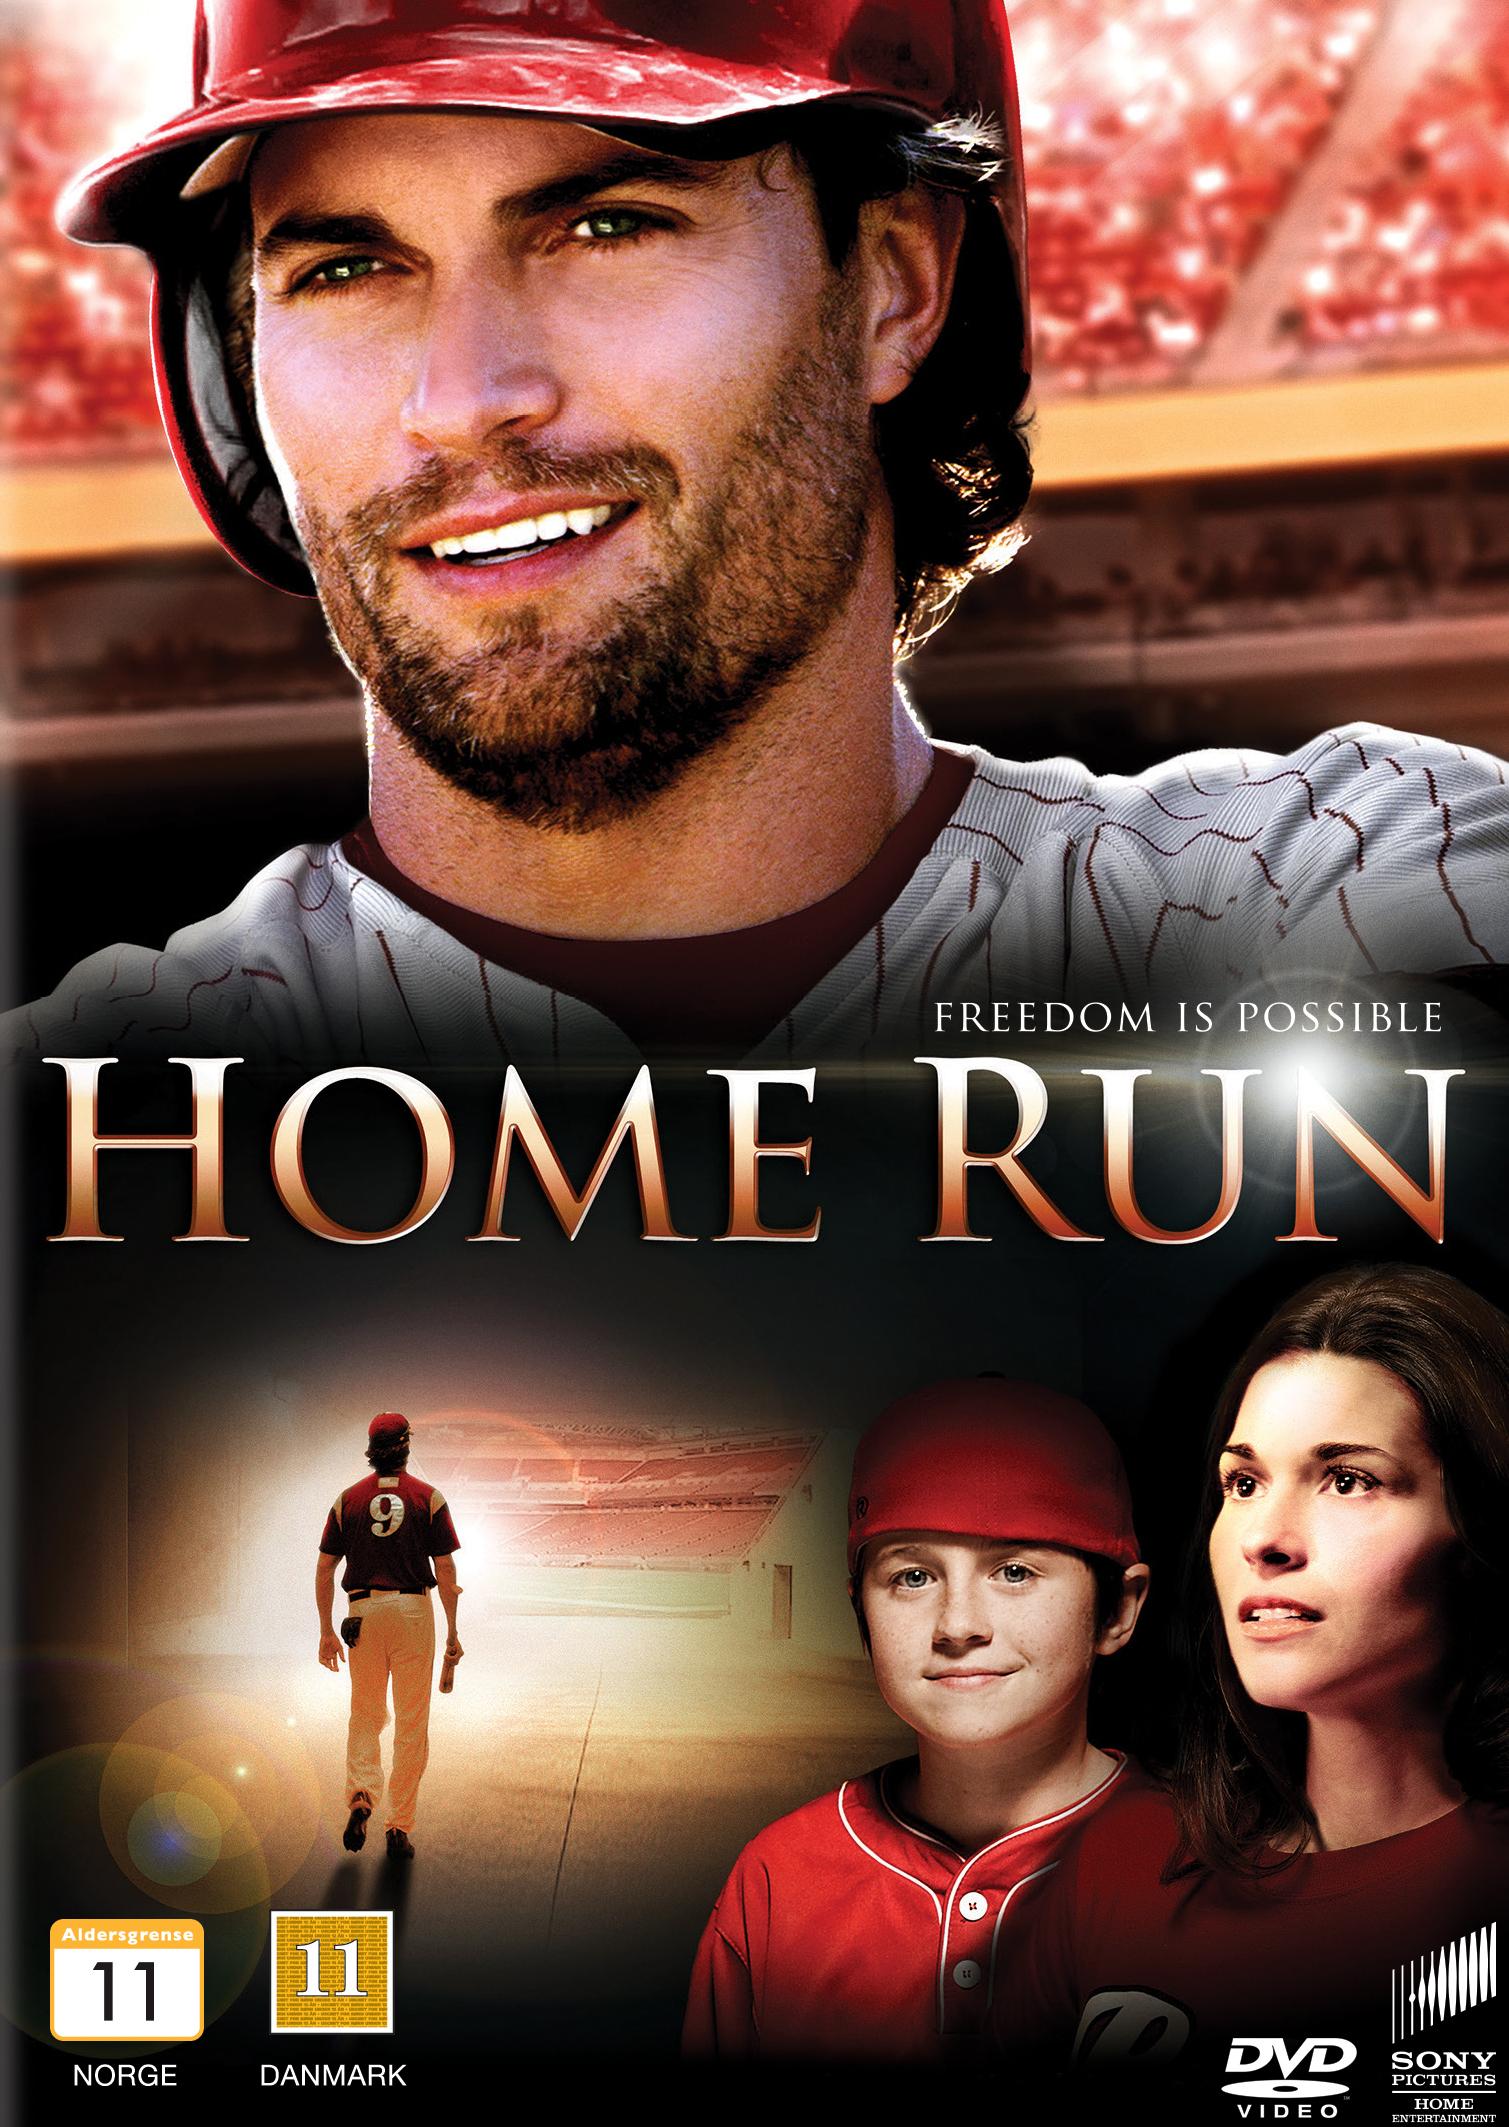 DVD: Home Run 5051162321316